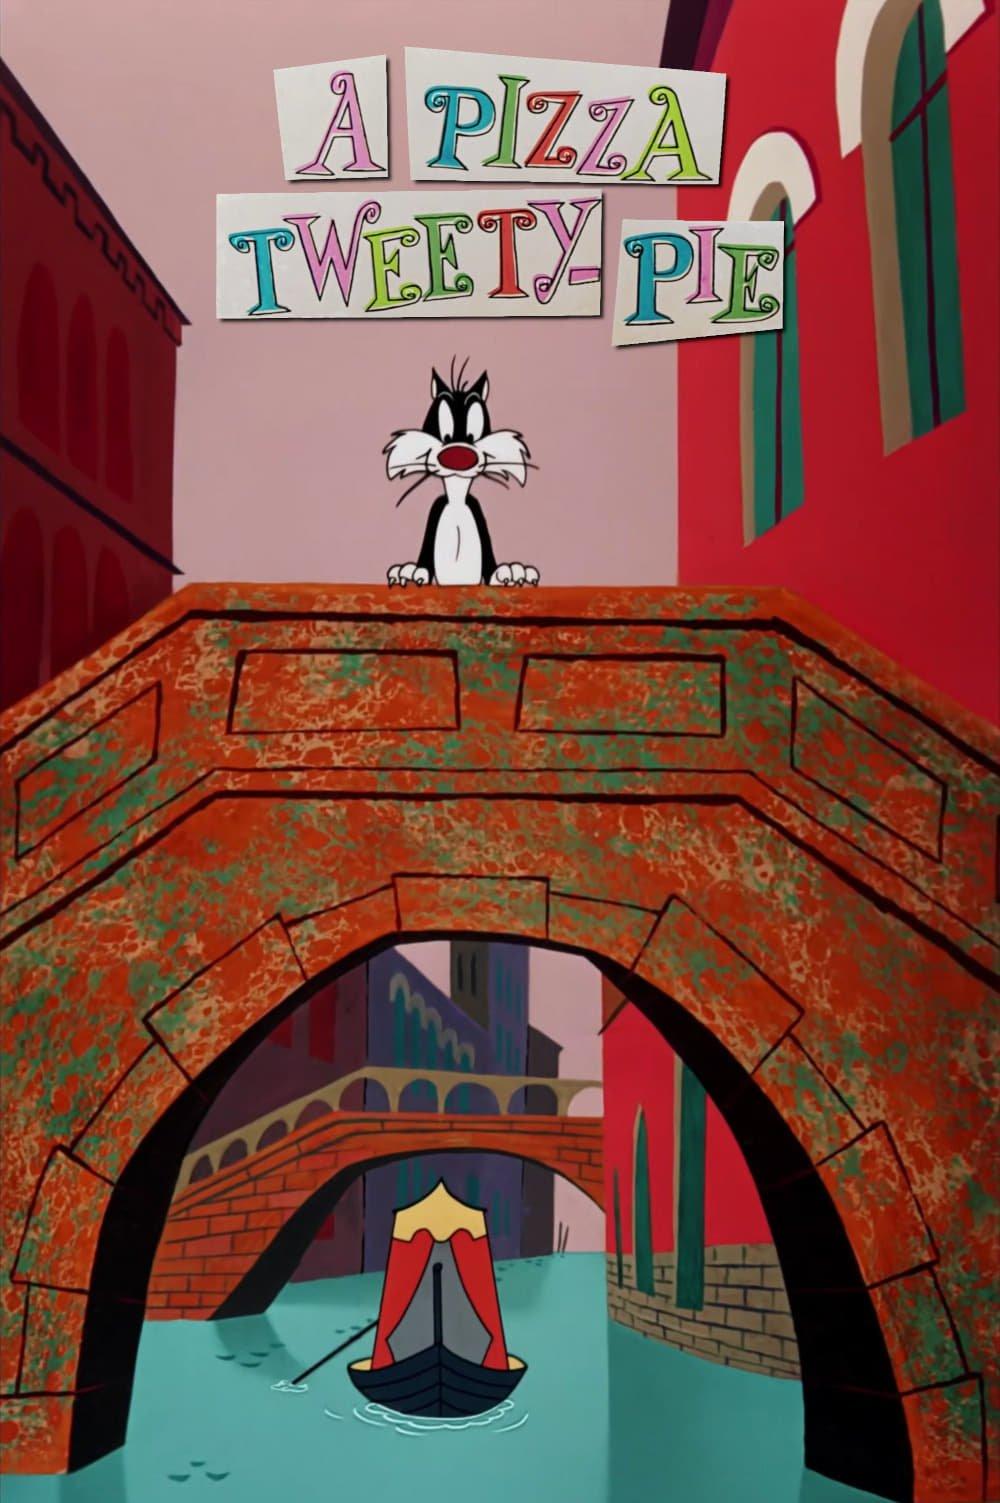 A Pizza Tweety-Pie